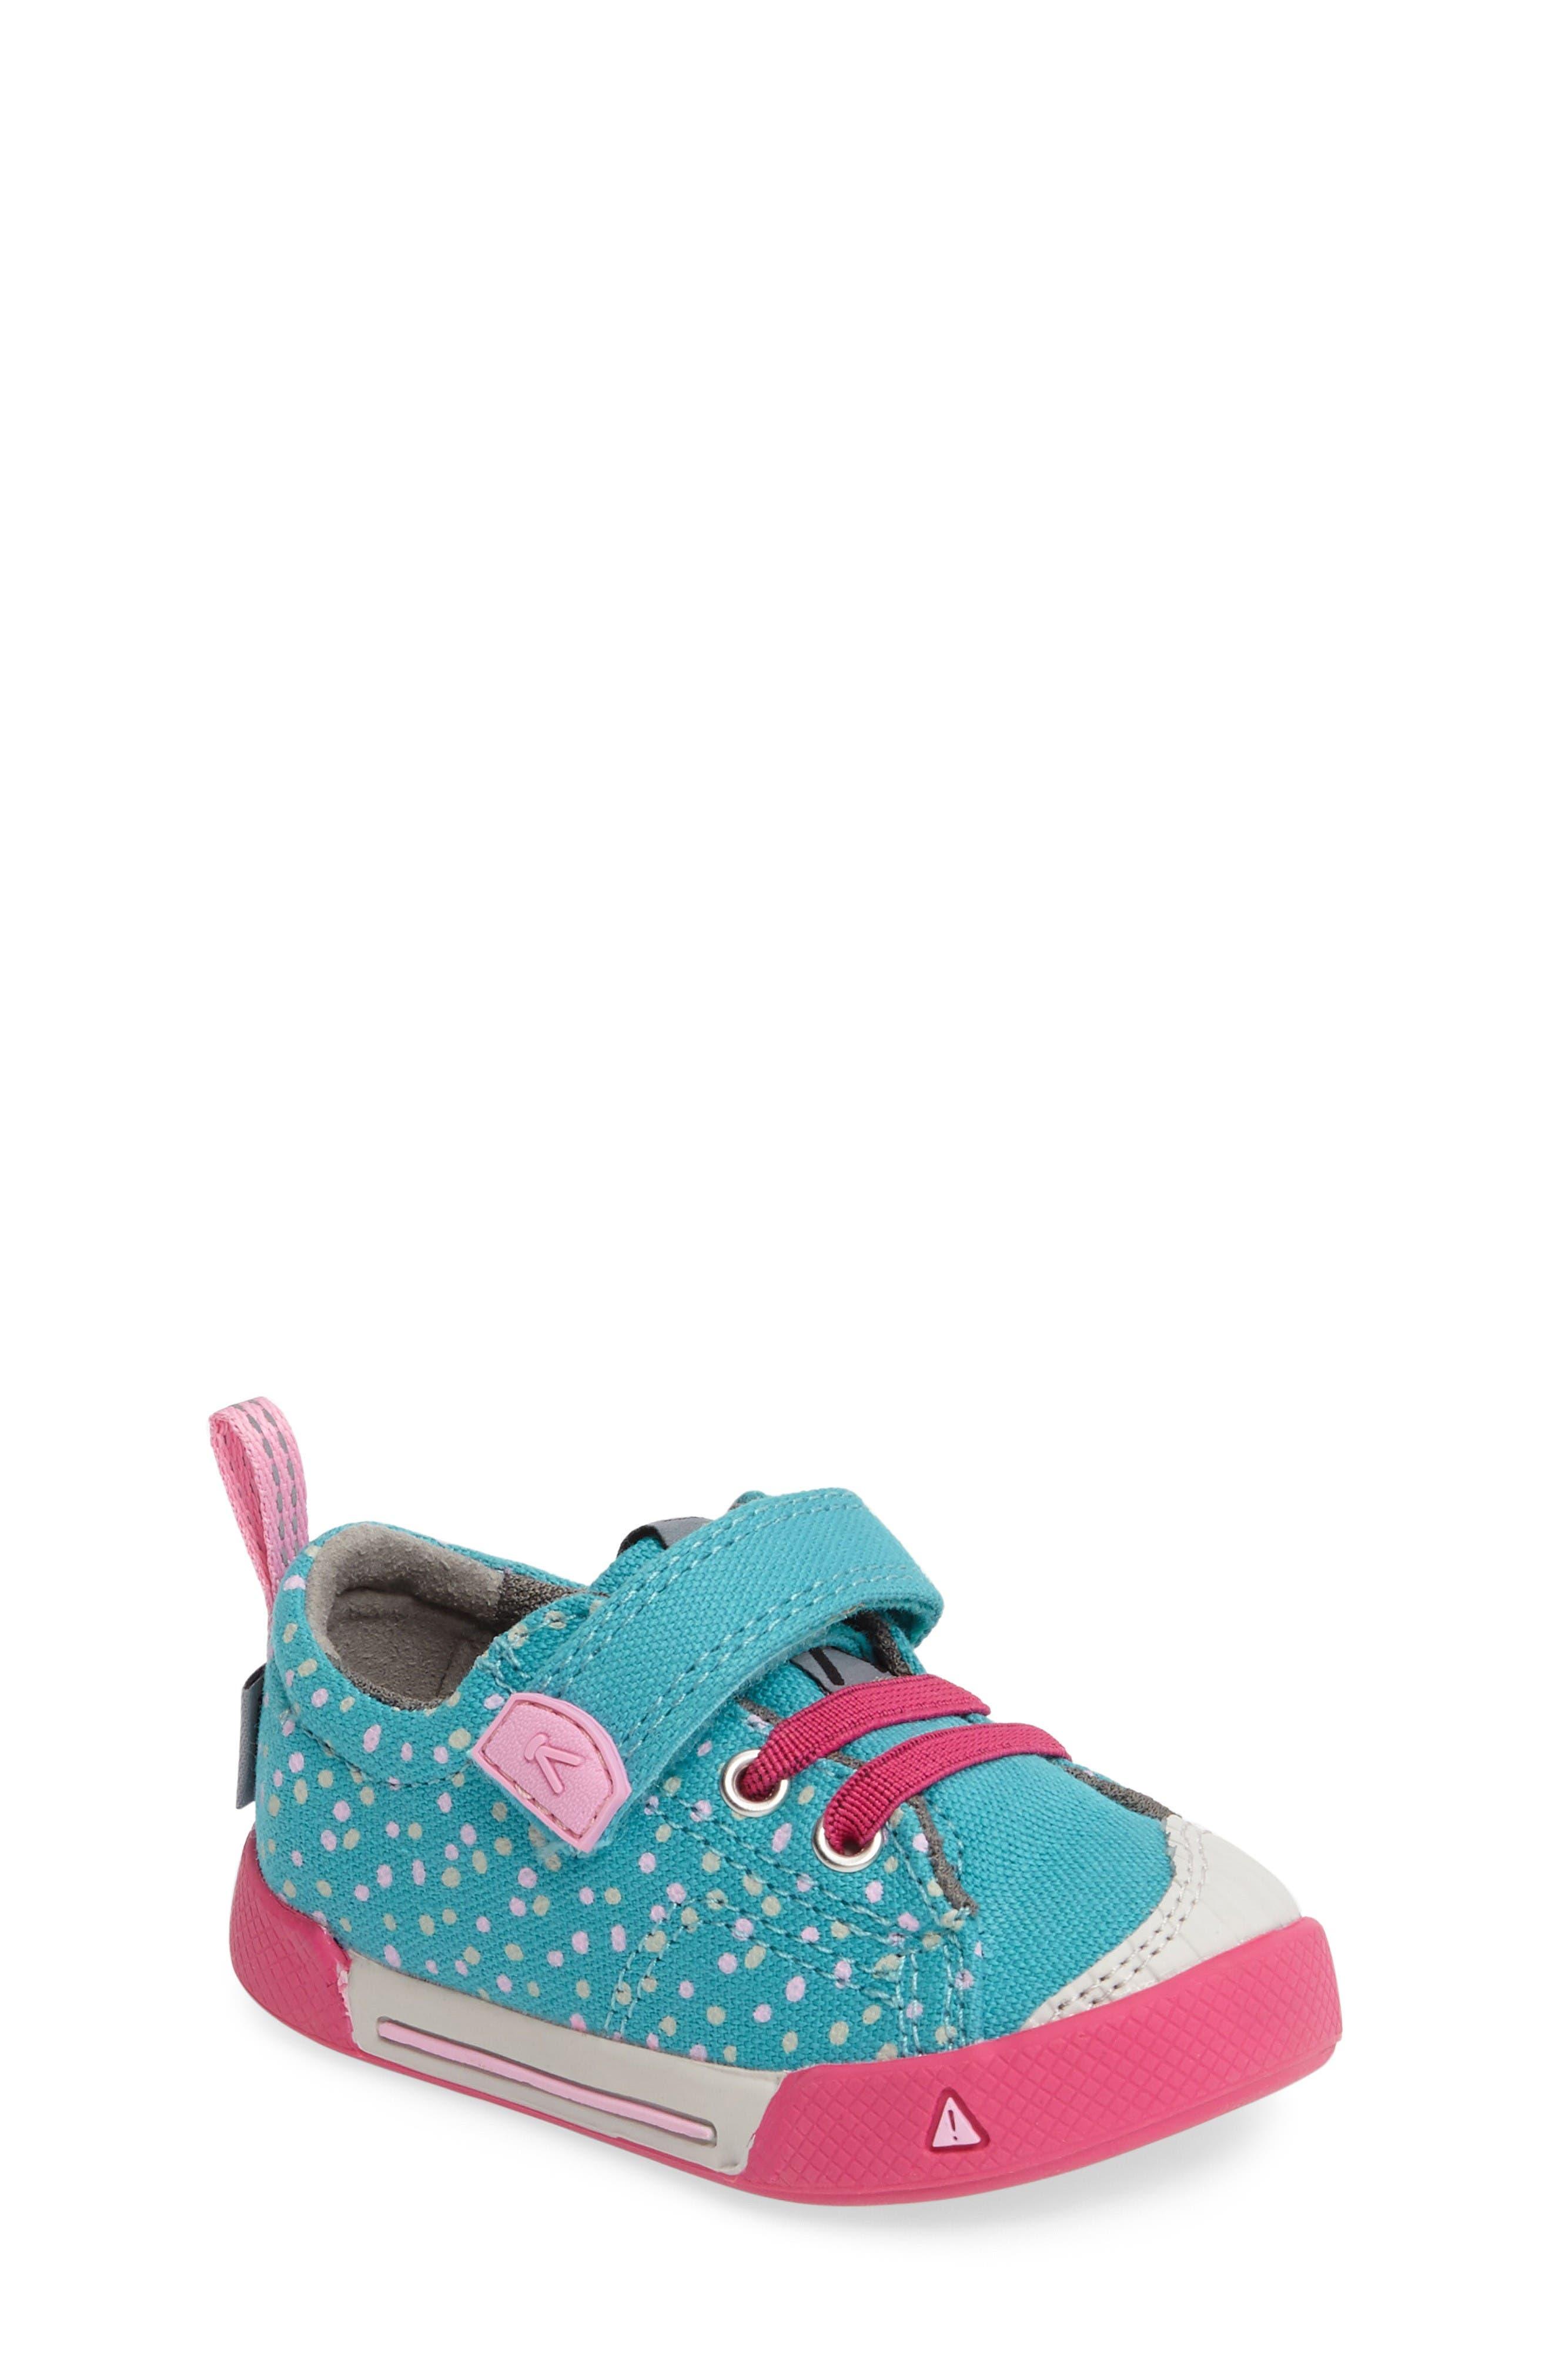 Keen Encanto Finley Sneaker (Baby, Walker, Toddler, Little Kid & Big Kid)